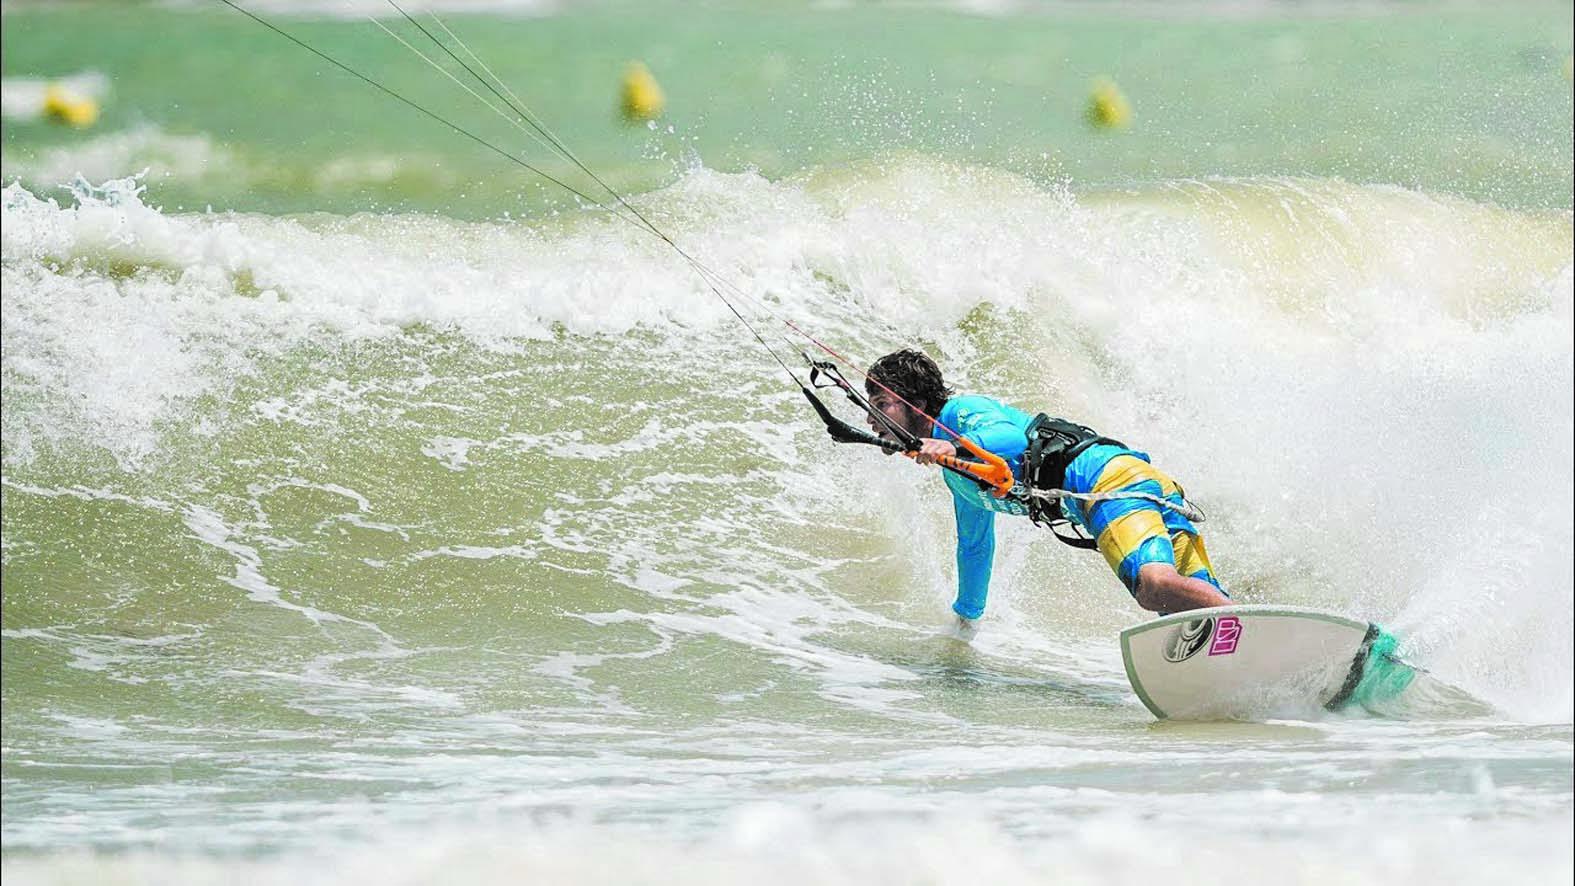 "Clôture en apothéose du  championnat ""Moulay El Hassan GKA Kitesurf world tour Morocco-Dakhla 2017"""